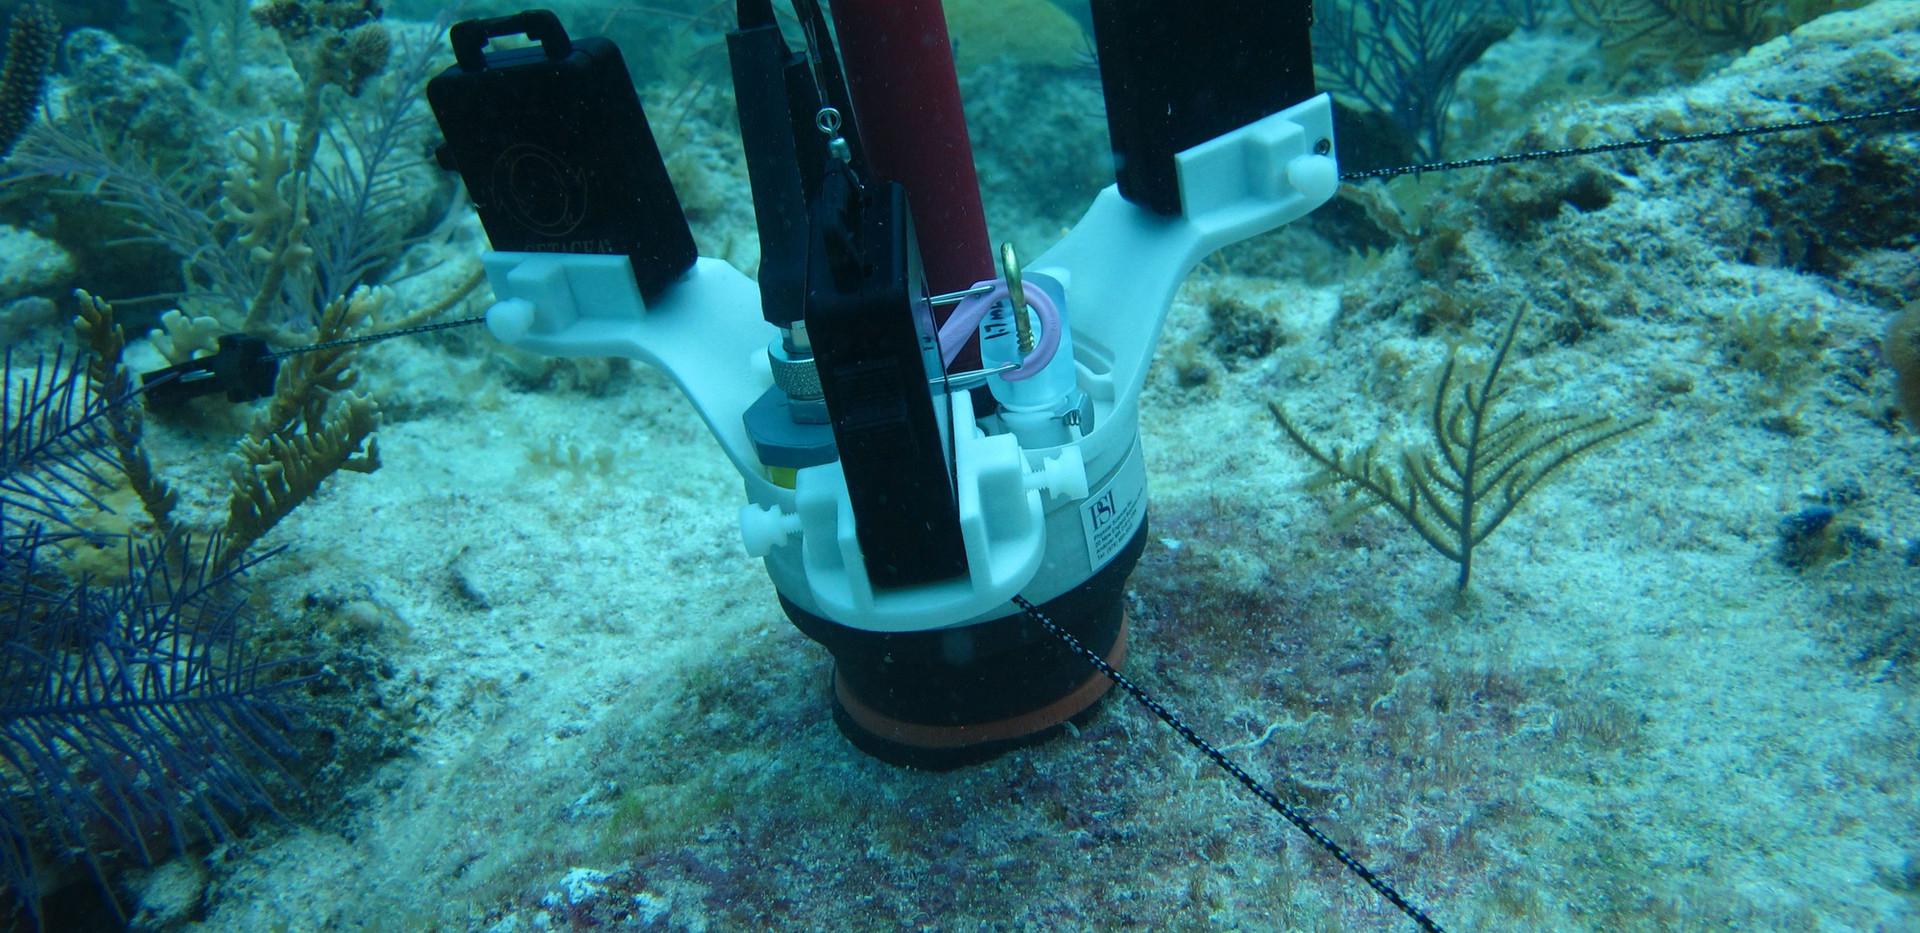 CISME deployed on algal turf